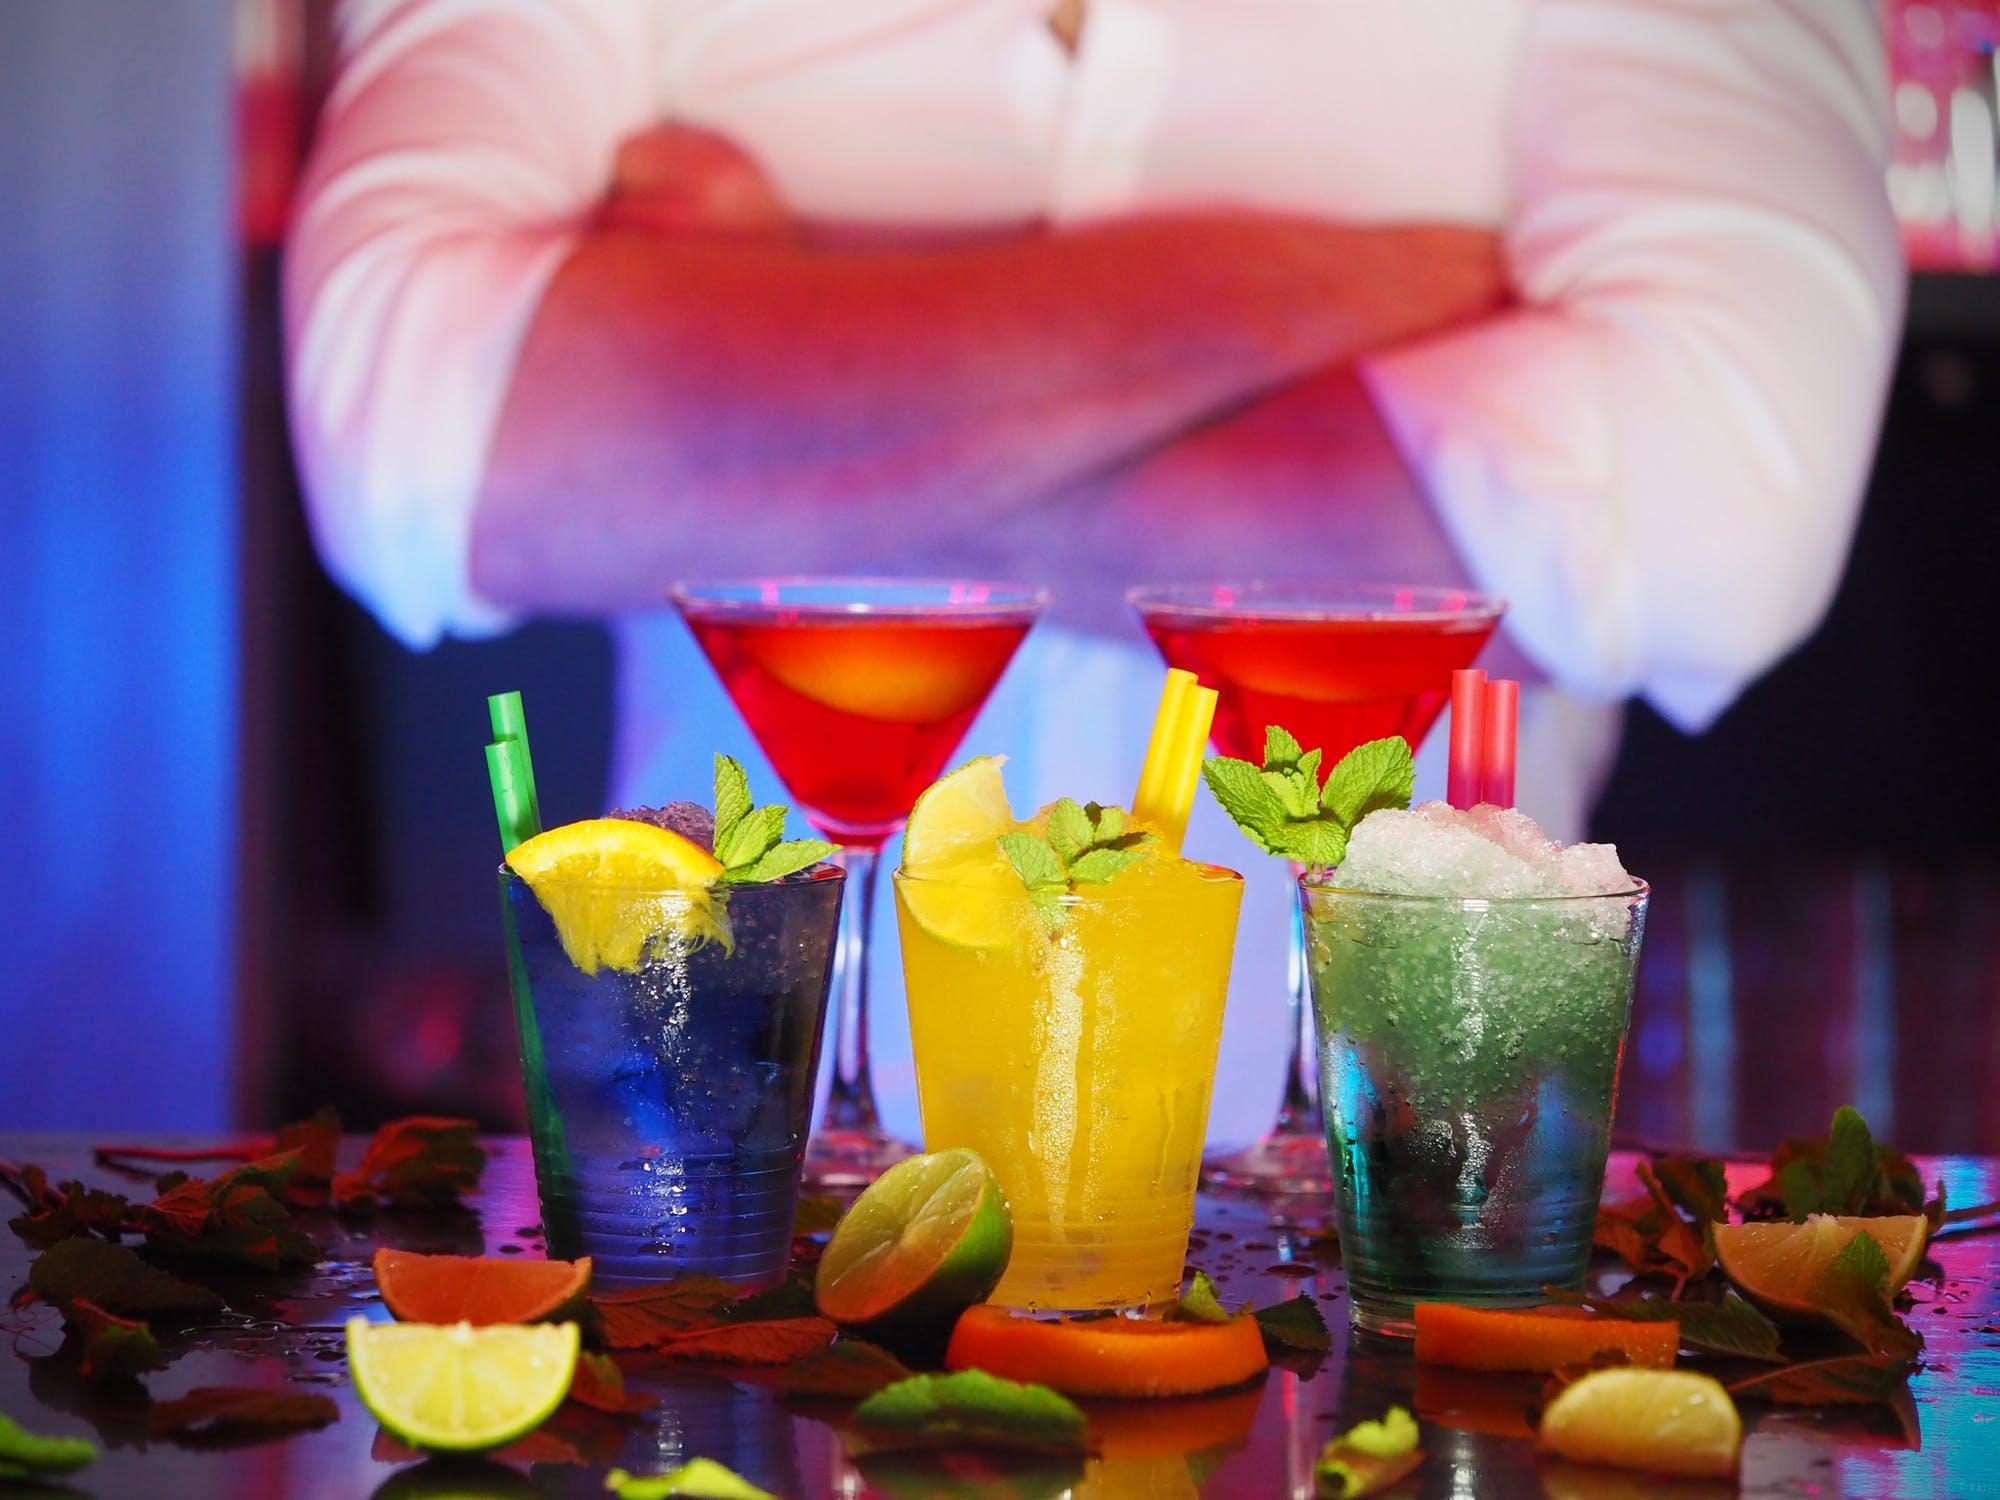 Liquor licenses in South Africa